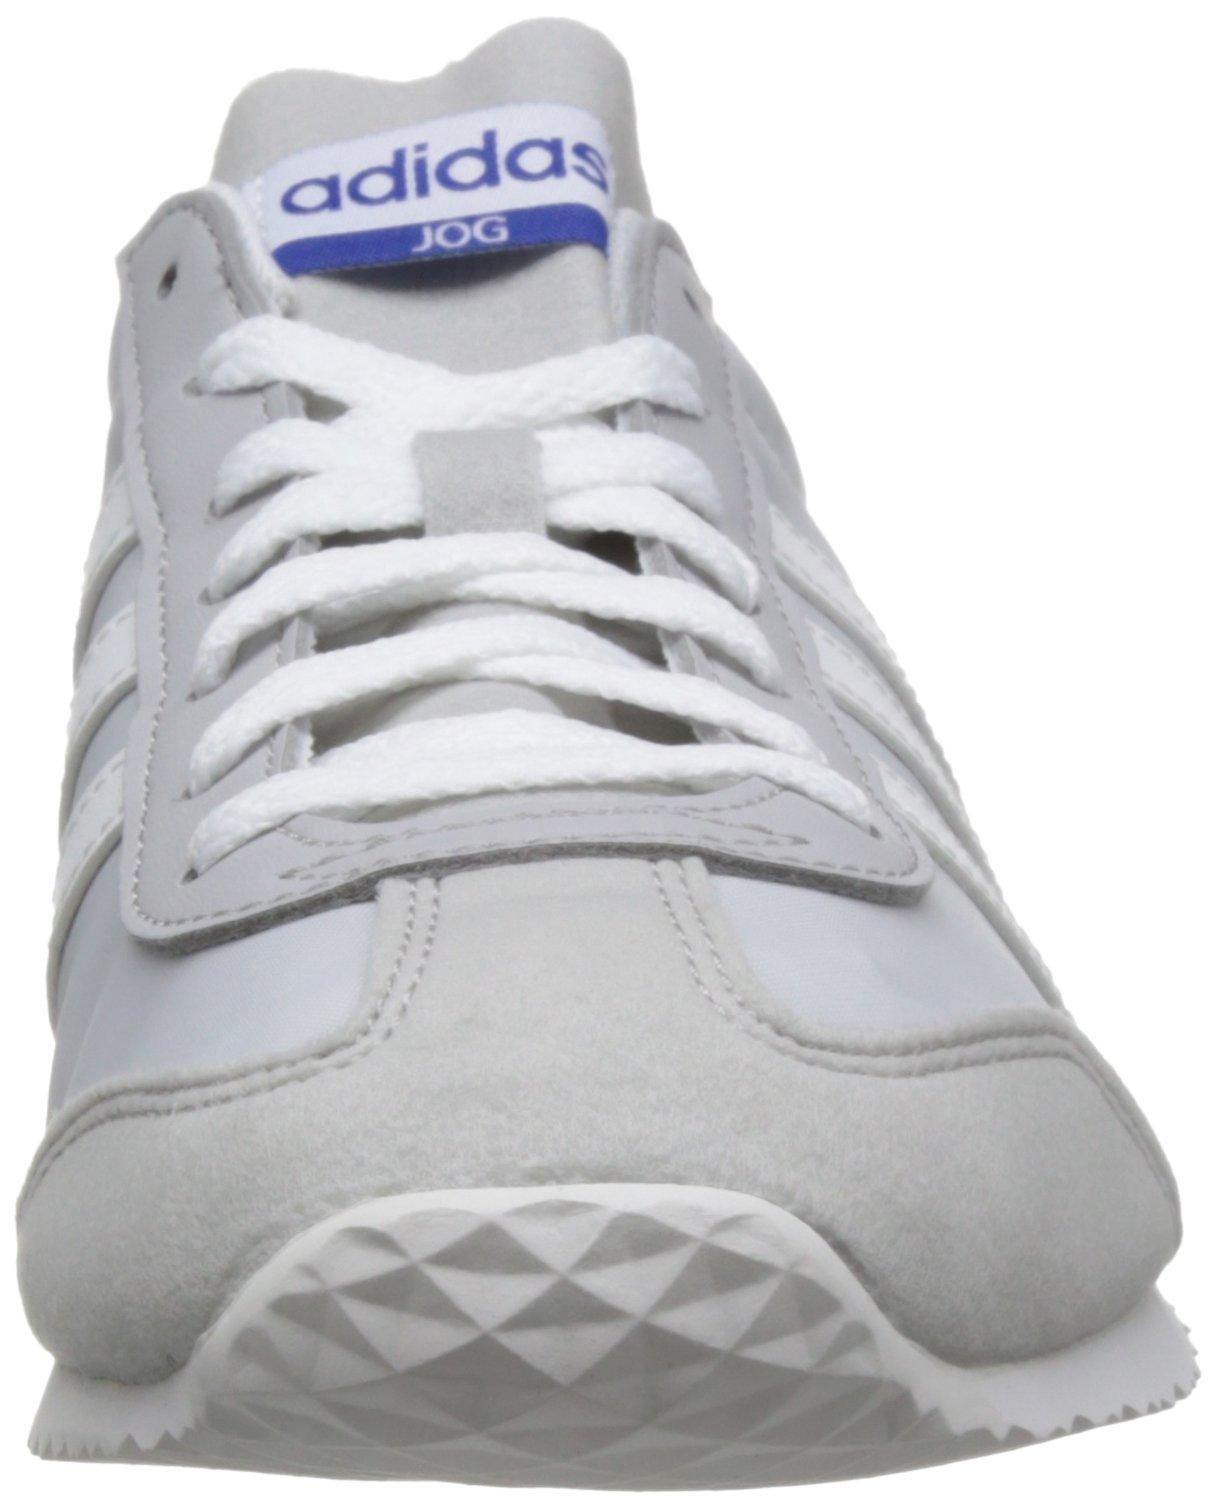 adidas Vs Jog, Zapatillas de Running Hombre